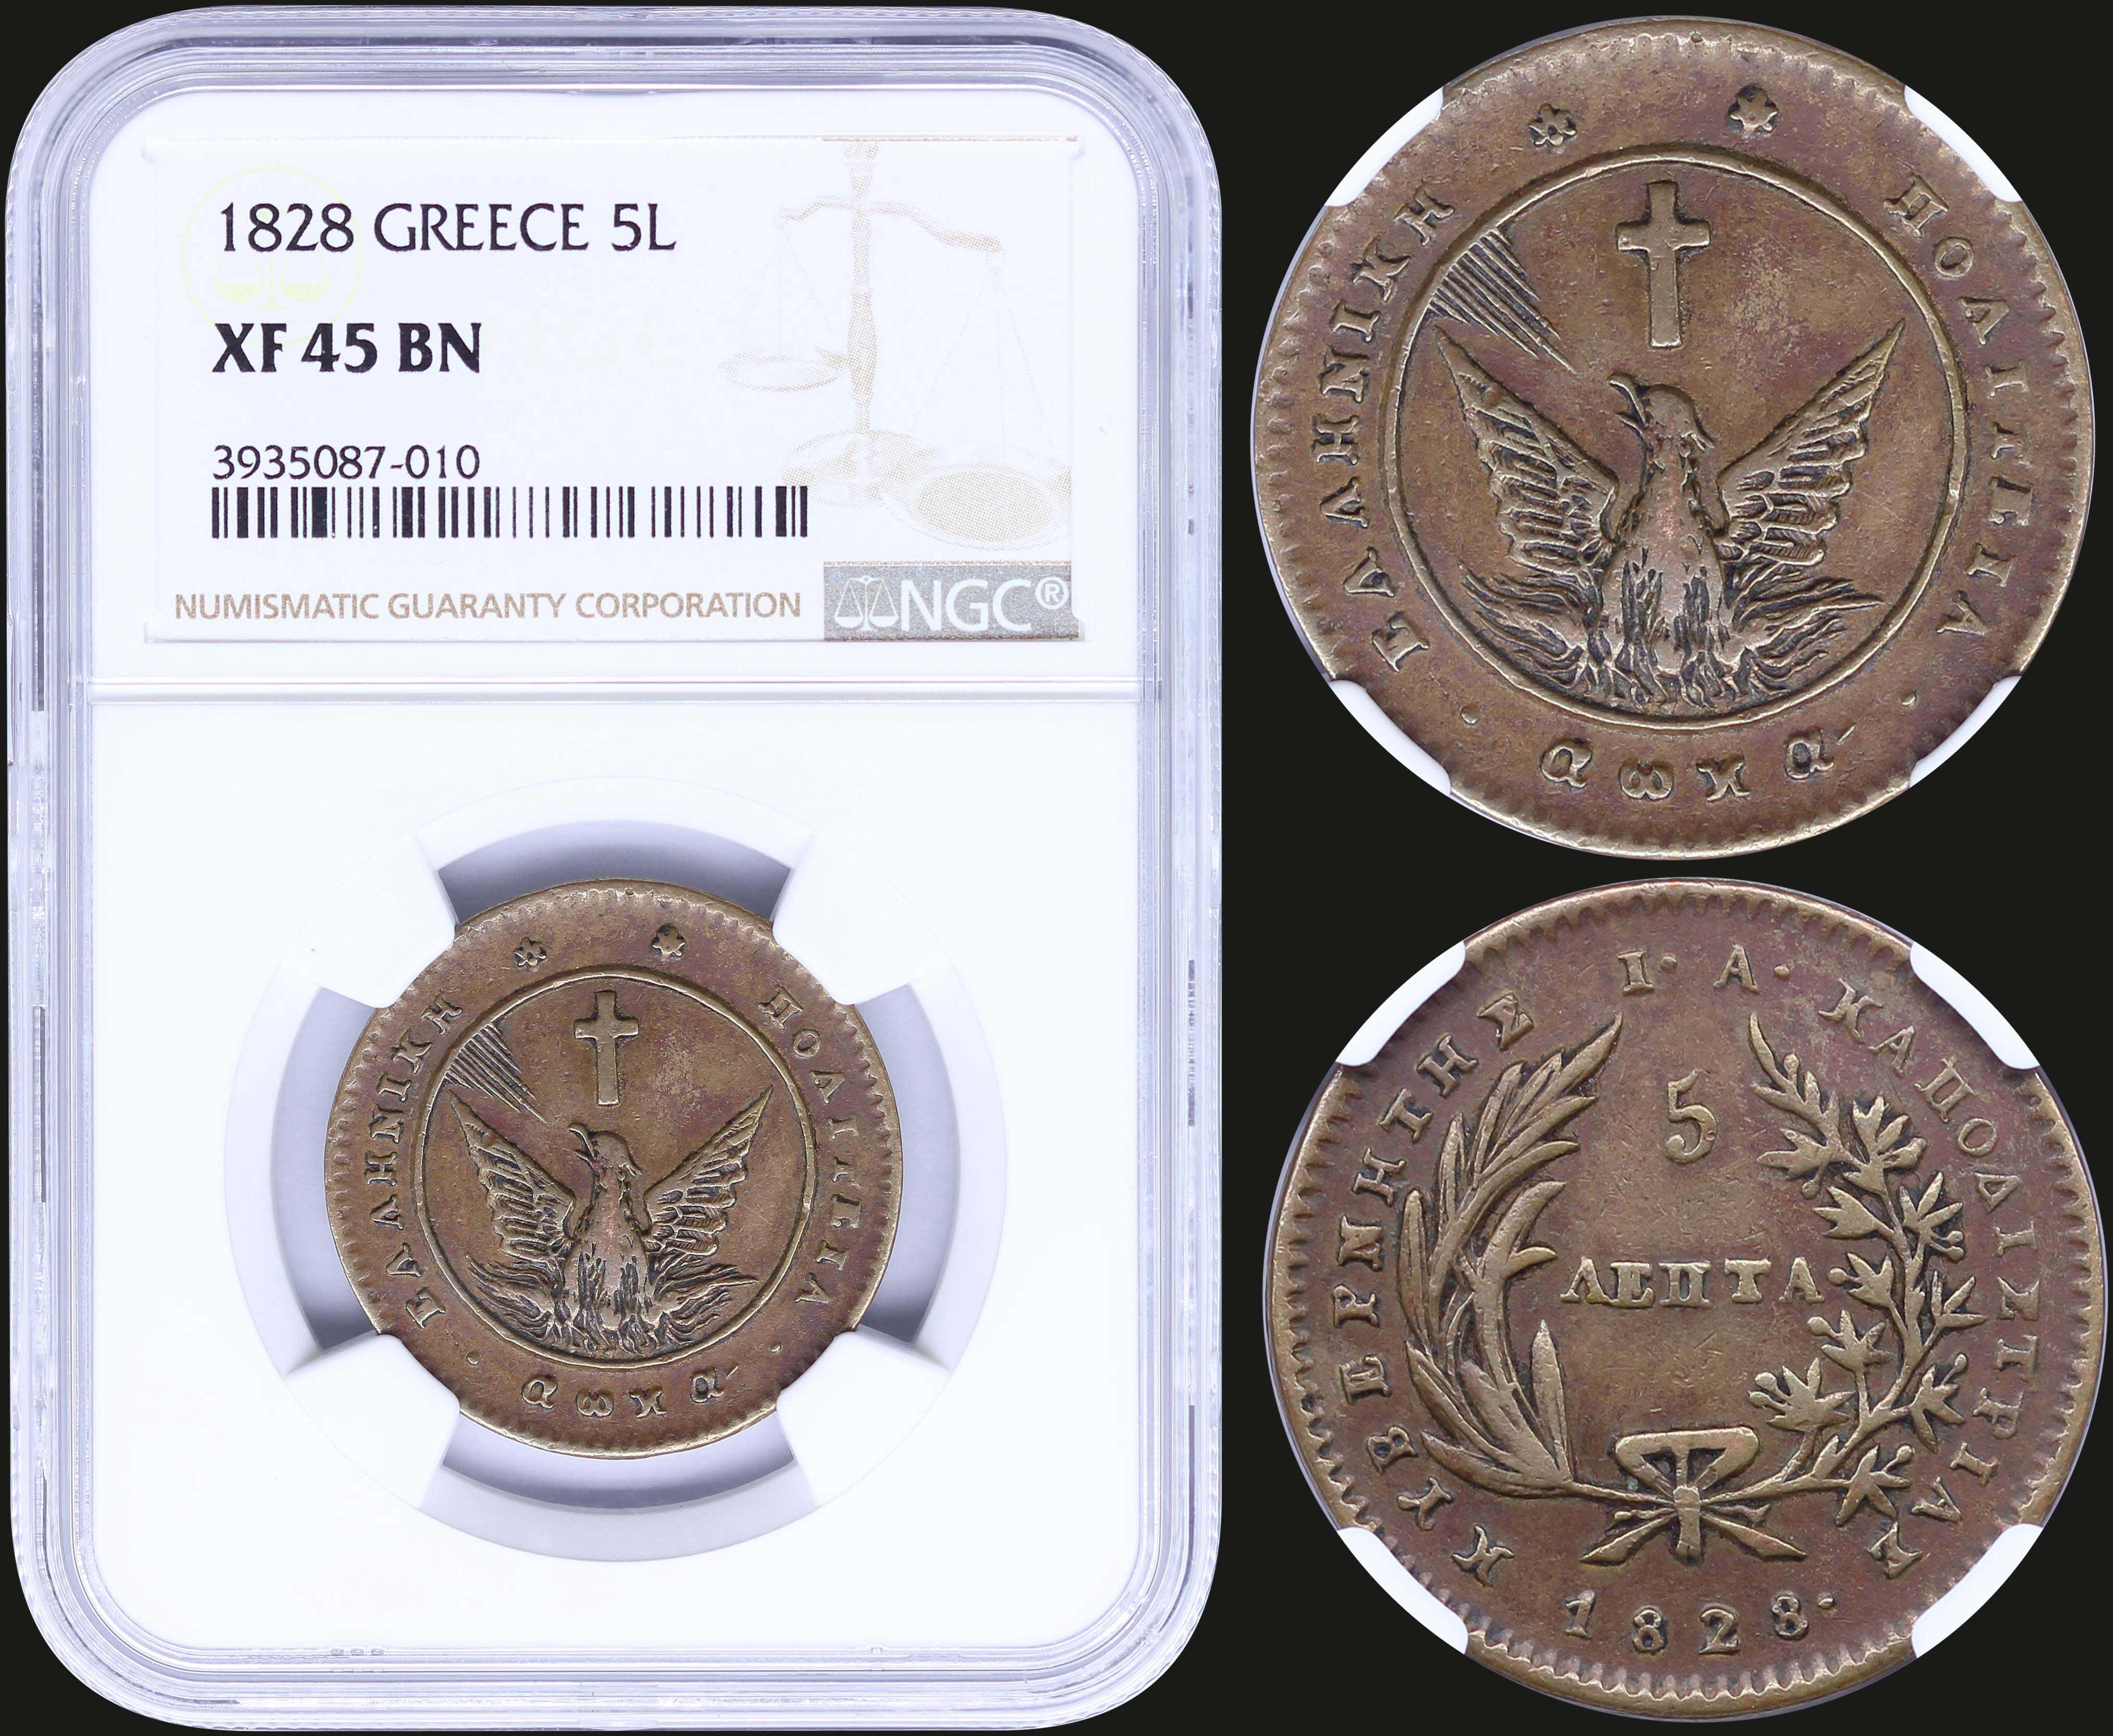 Lot 8012 - -  COINS & TOKENS governor capodistrias -  A. Karamitsos Public & Live Bid Auction 644 Coins, Medals & Banknotes